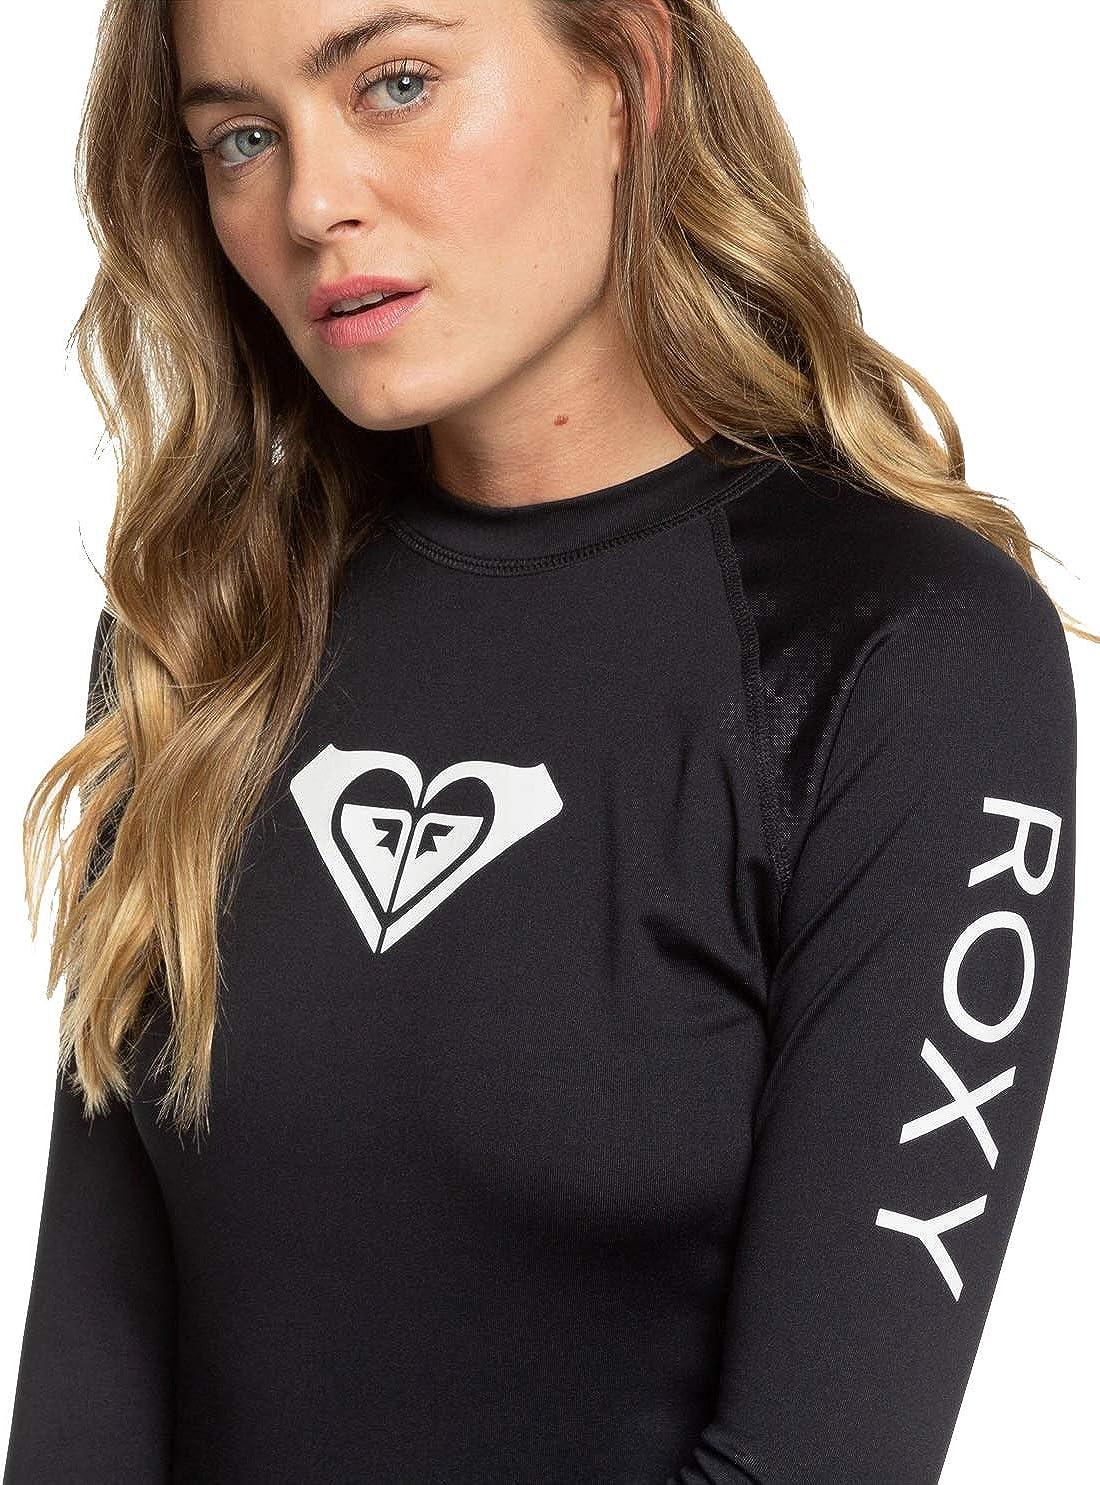 Roxy Women's Whole Hearted Long Sleeve UPF 50 Rashguard